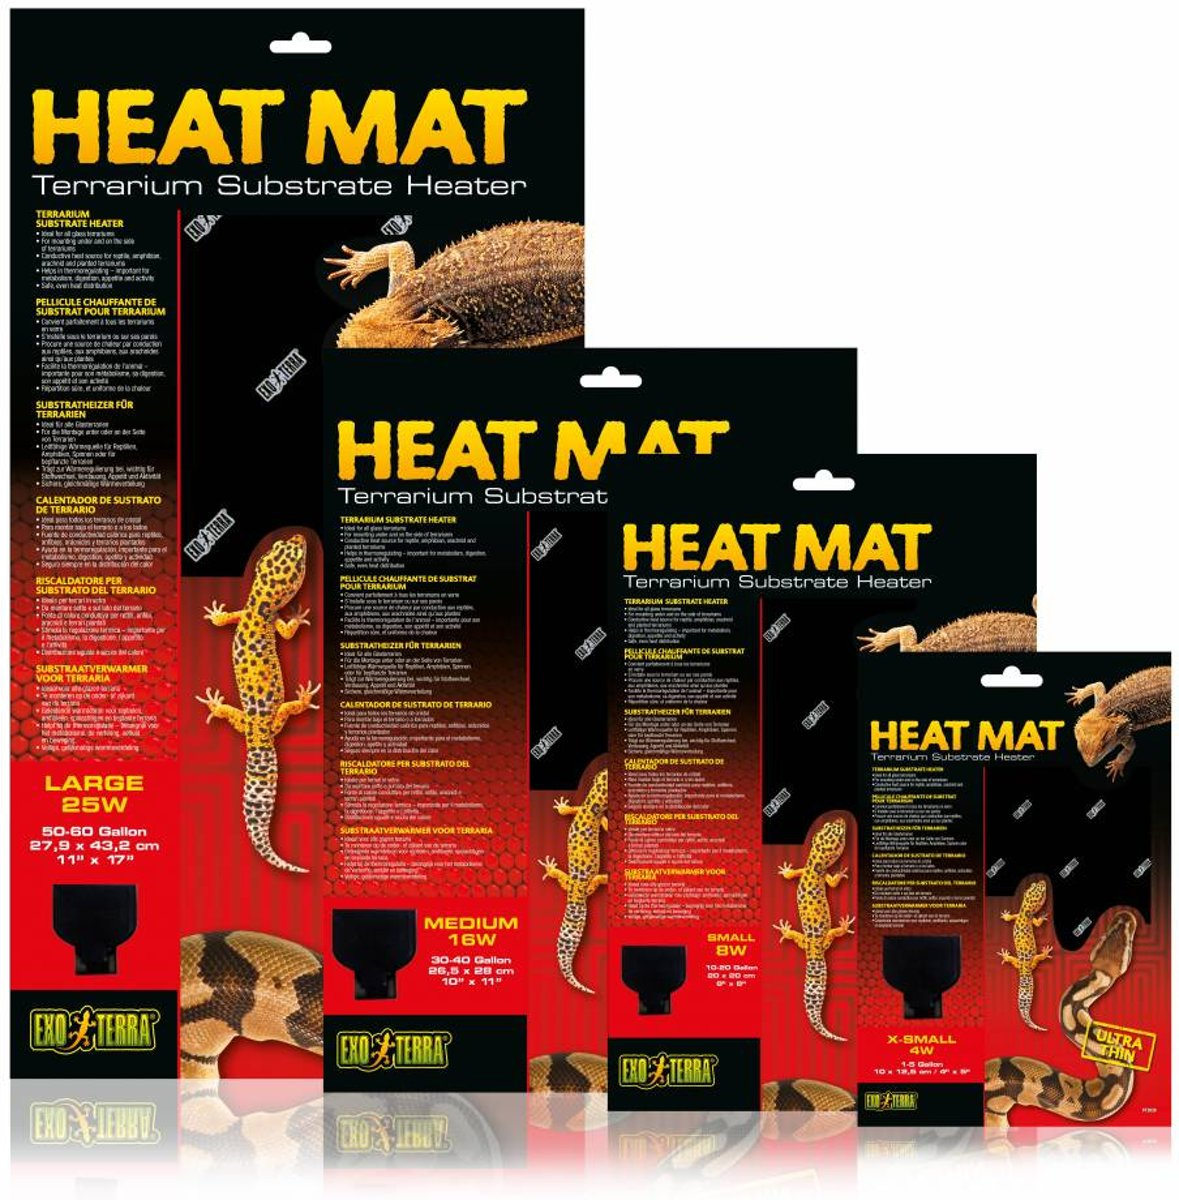 Exo Terra Heat Mat Maat - 10 x 12 cm